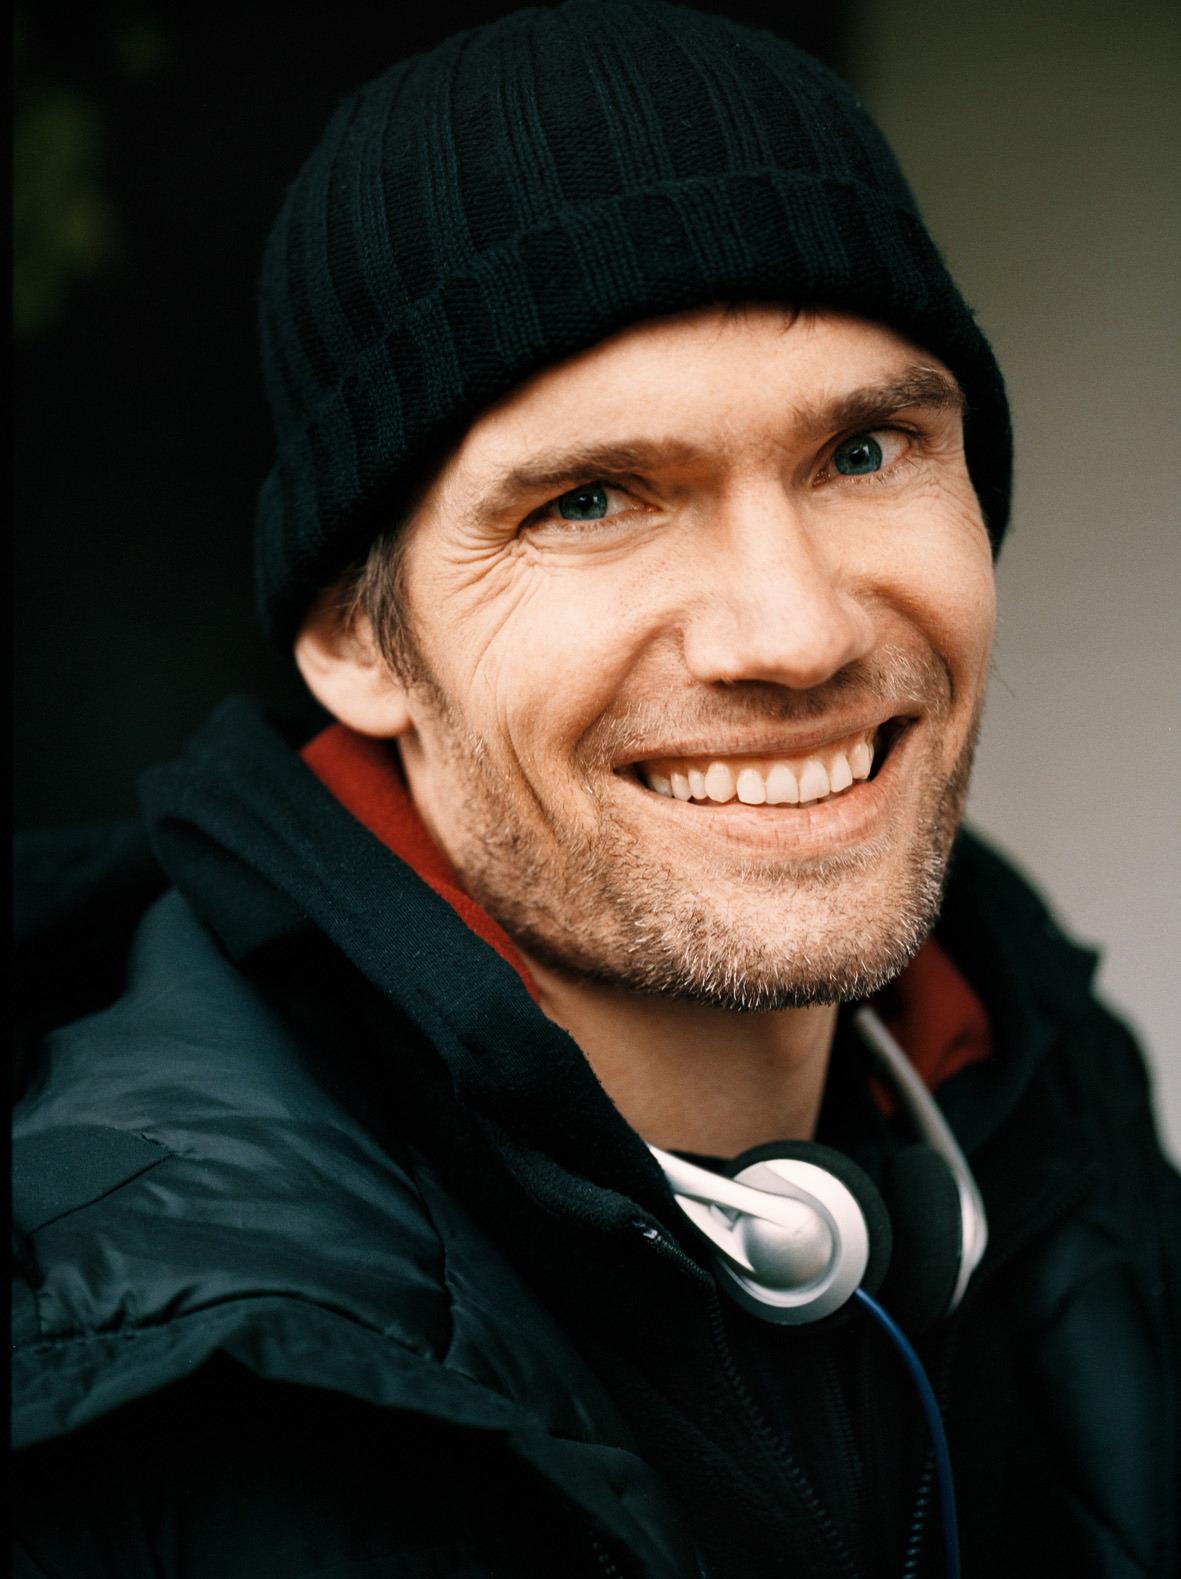 Christian Zübert